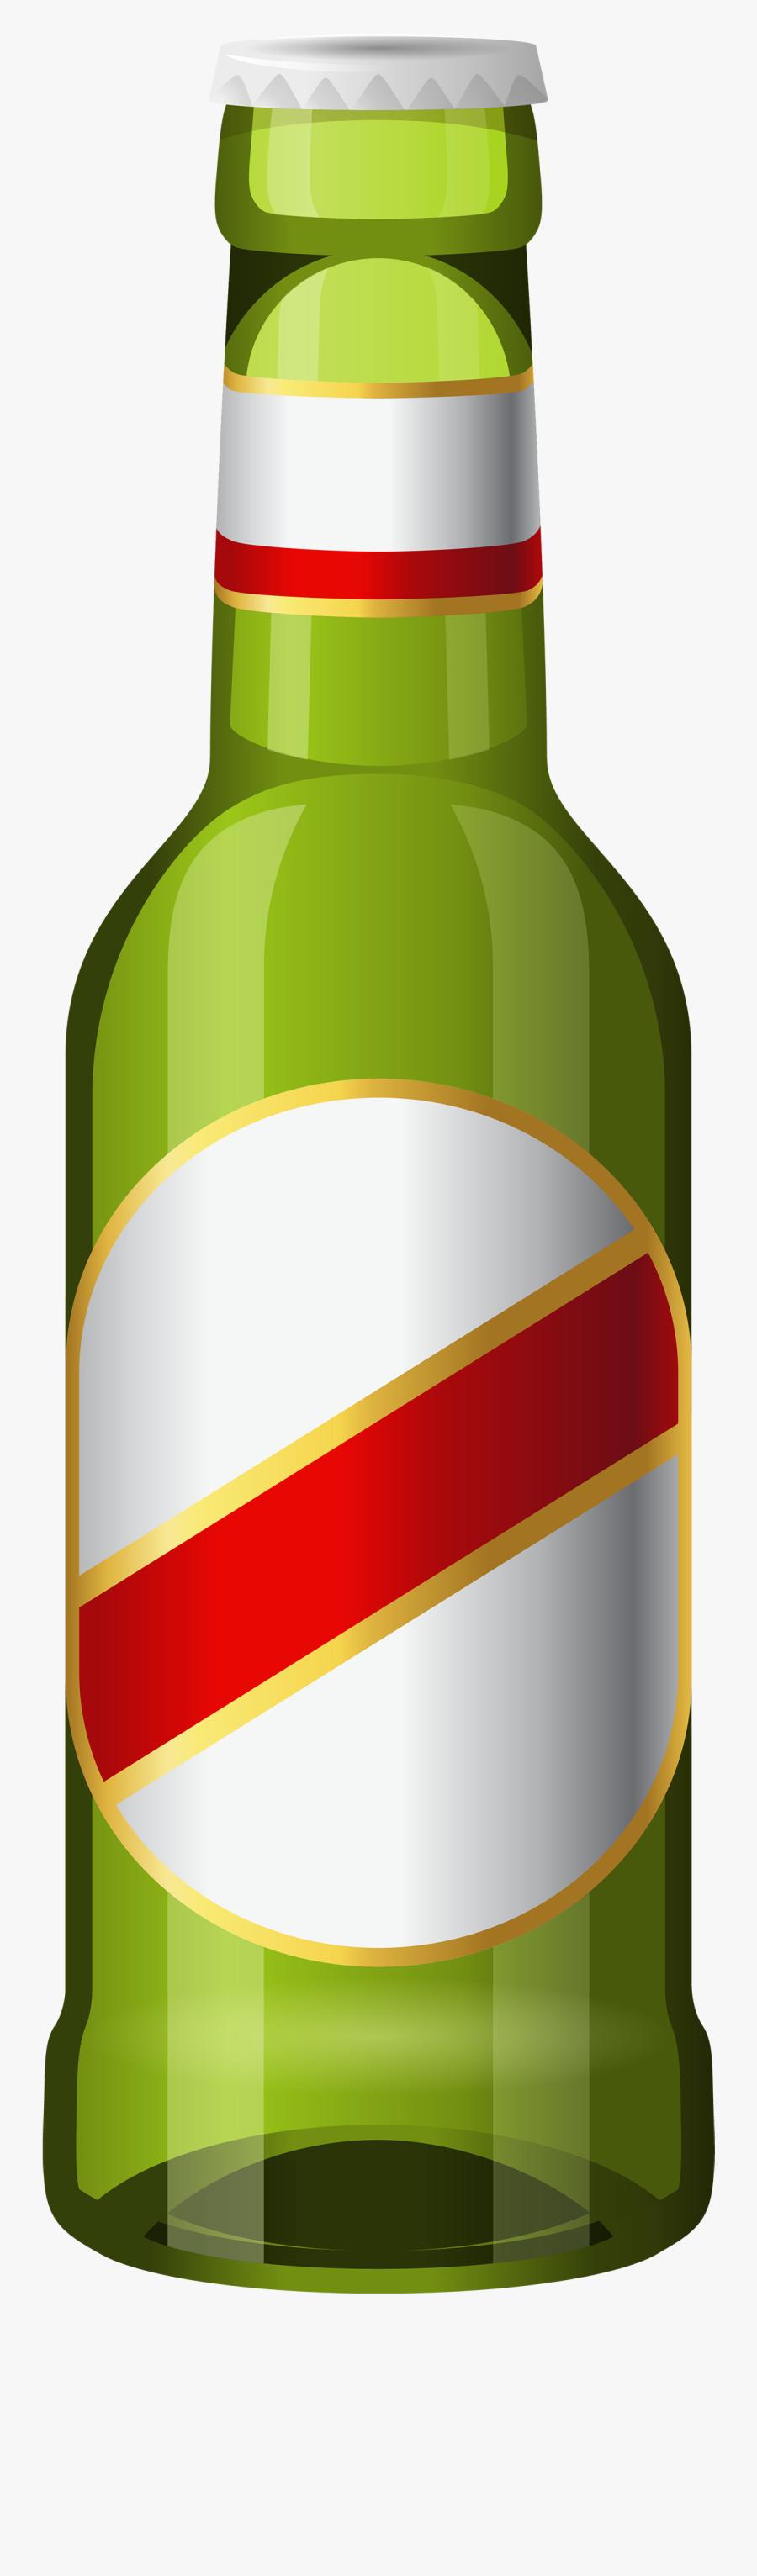 Beer Bottle Clip Art Beer Bottle Clipart Photo Niceclipart - Beer Bottle Clipart Png, Transparent Clipart